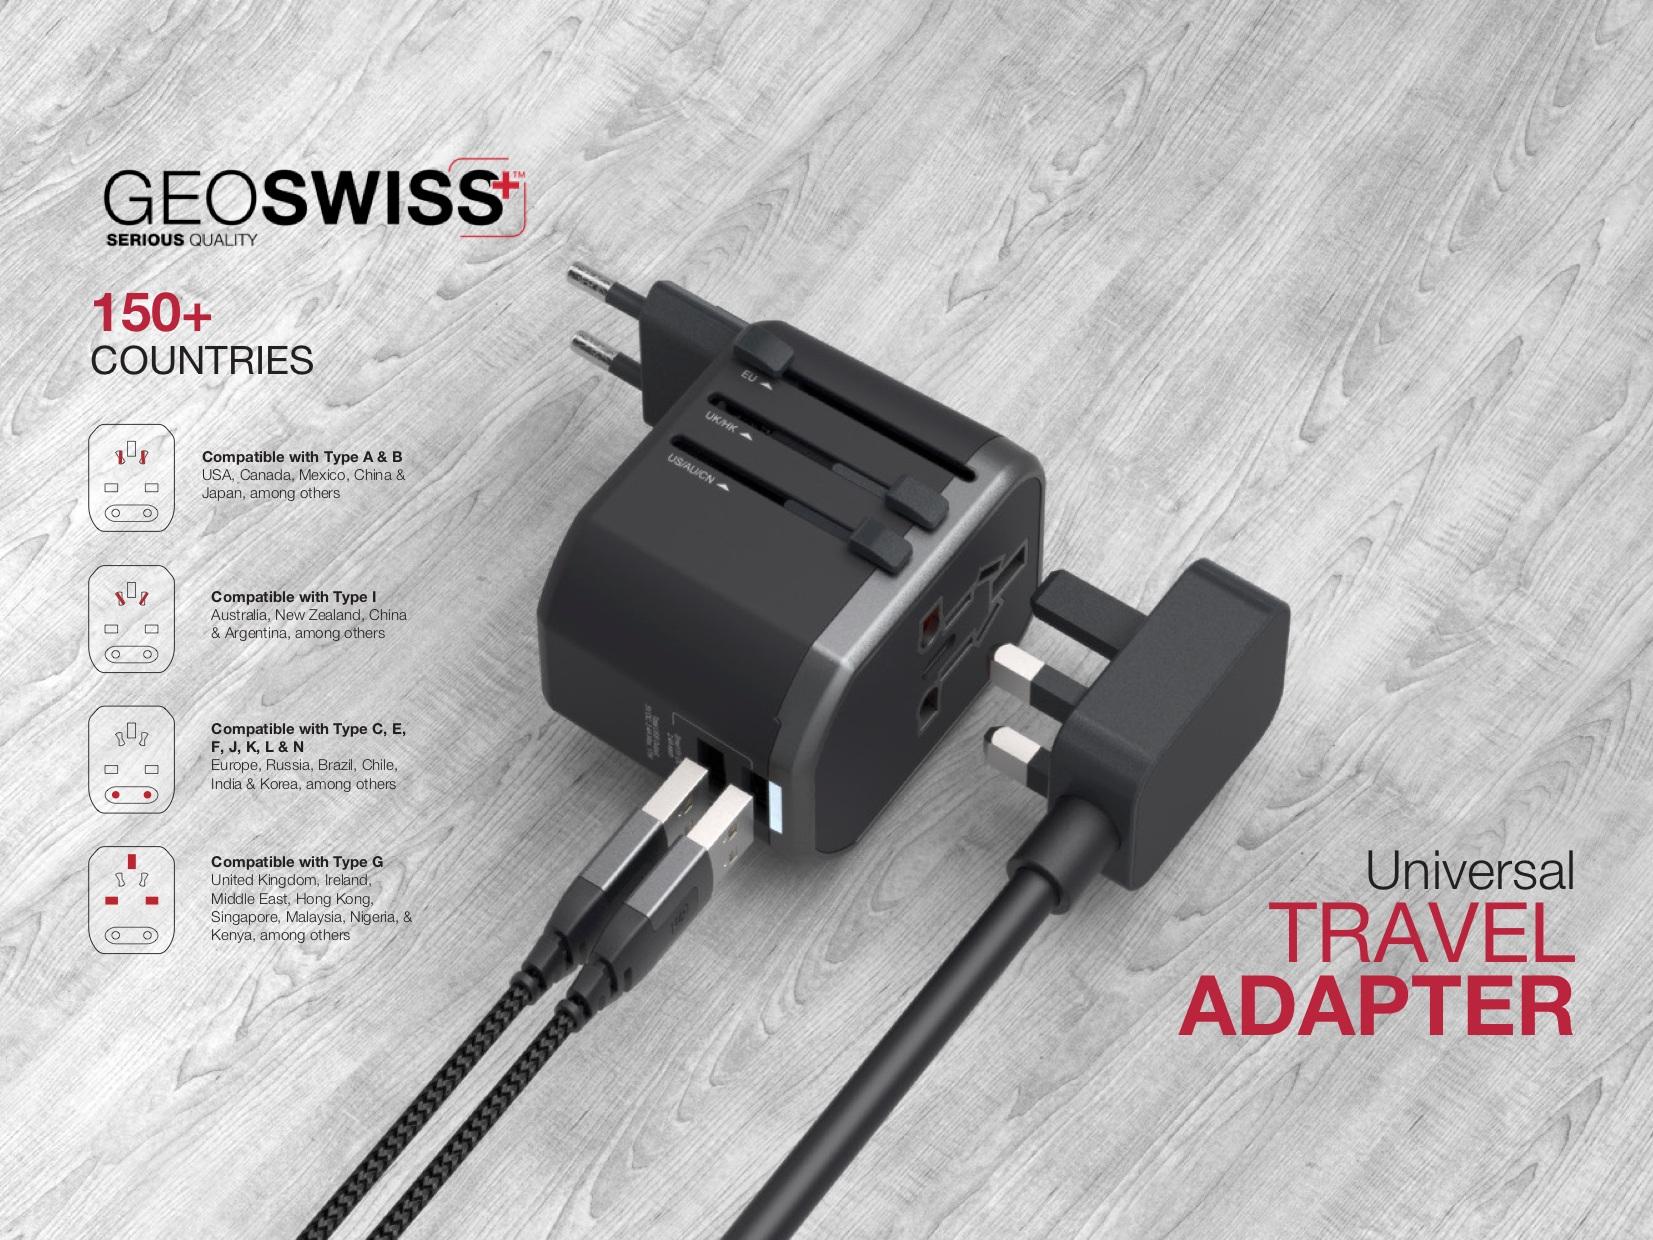 GeoSWISS+Universal+Travel+Adapter+for+website.jpg